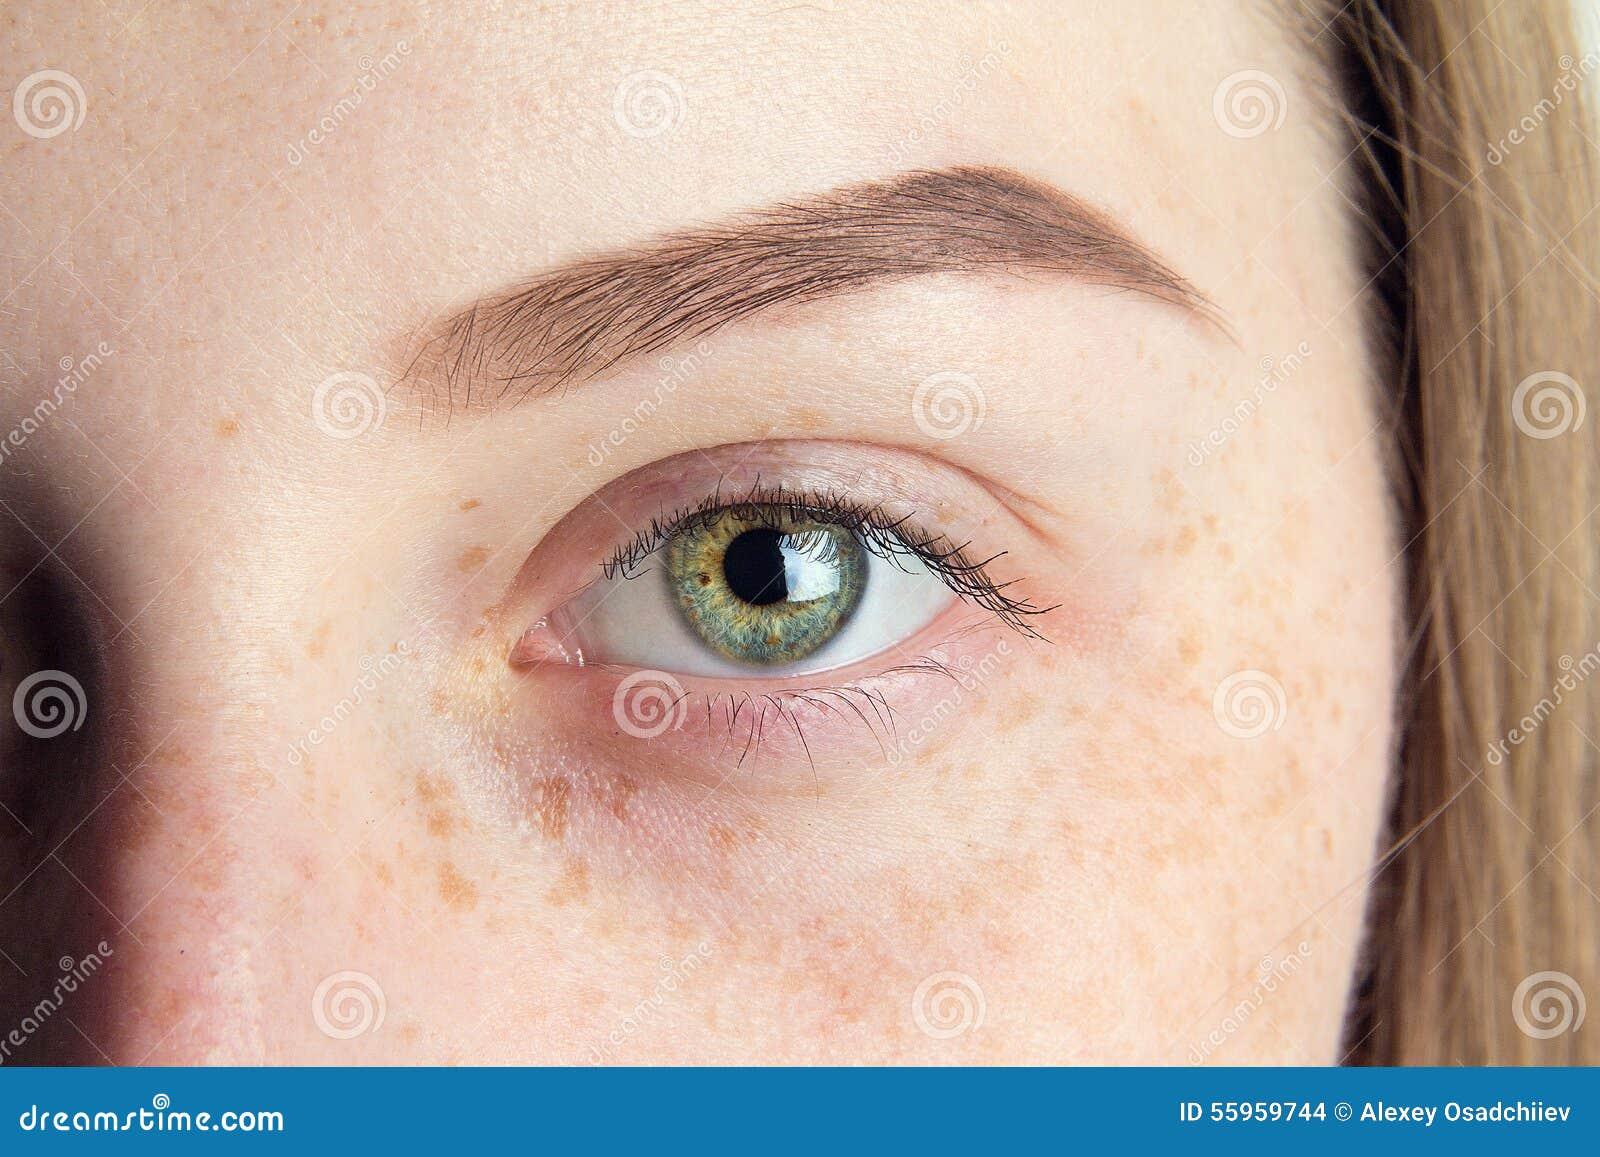 Close Up Eye And Eyebrow Stock Photo